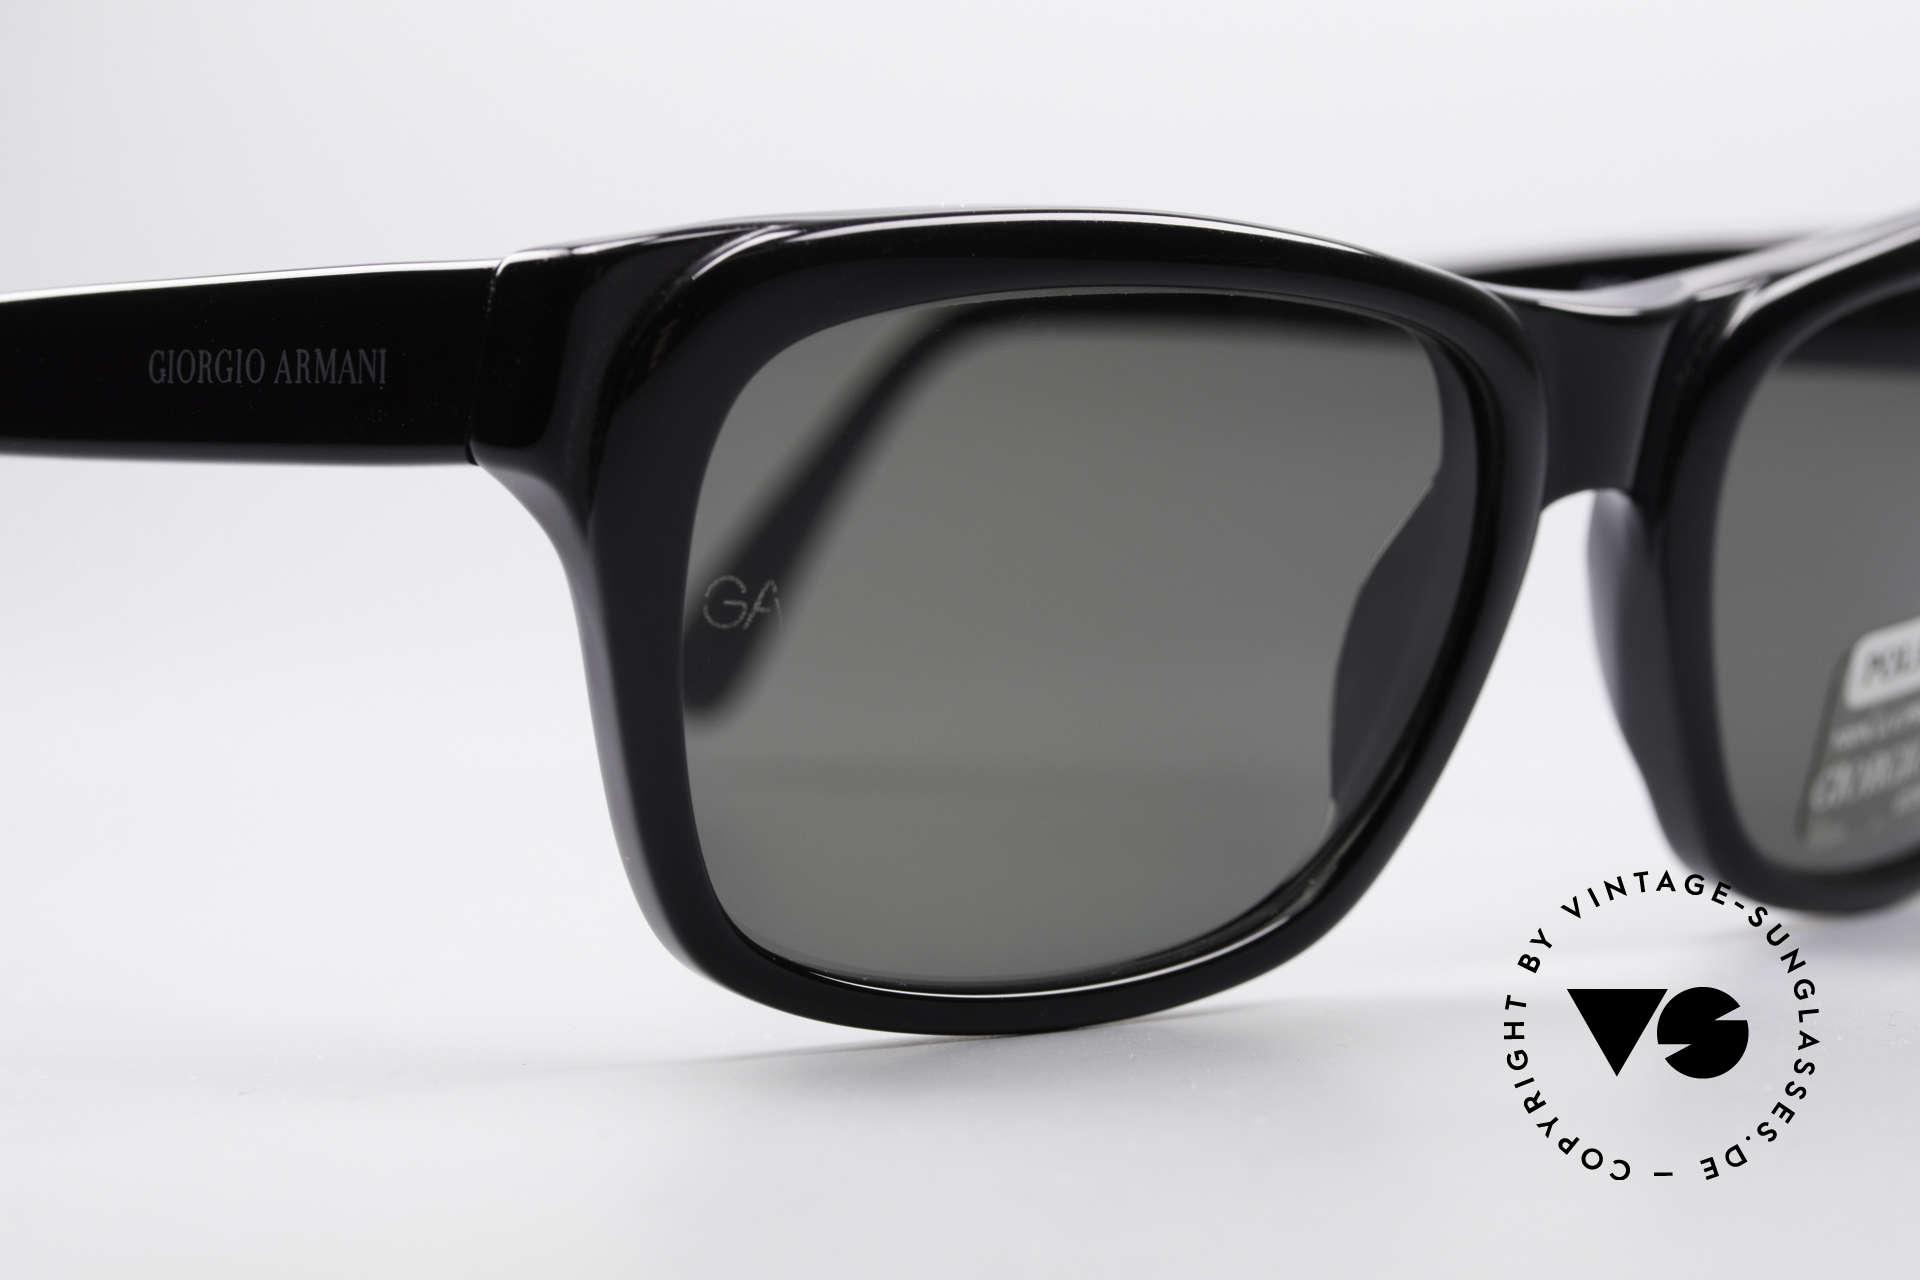 94131d63cabe Sunglasses Giorgio Armani 846 90 s Designer Shades Polarized ...